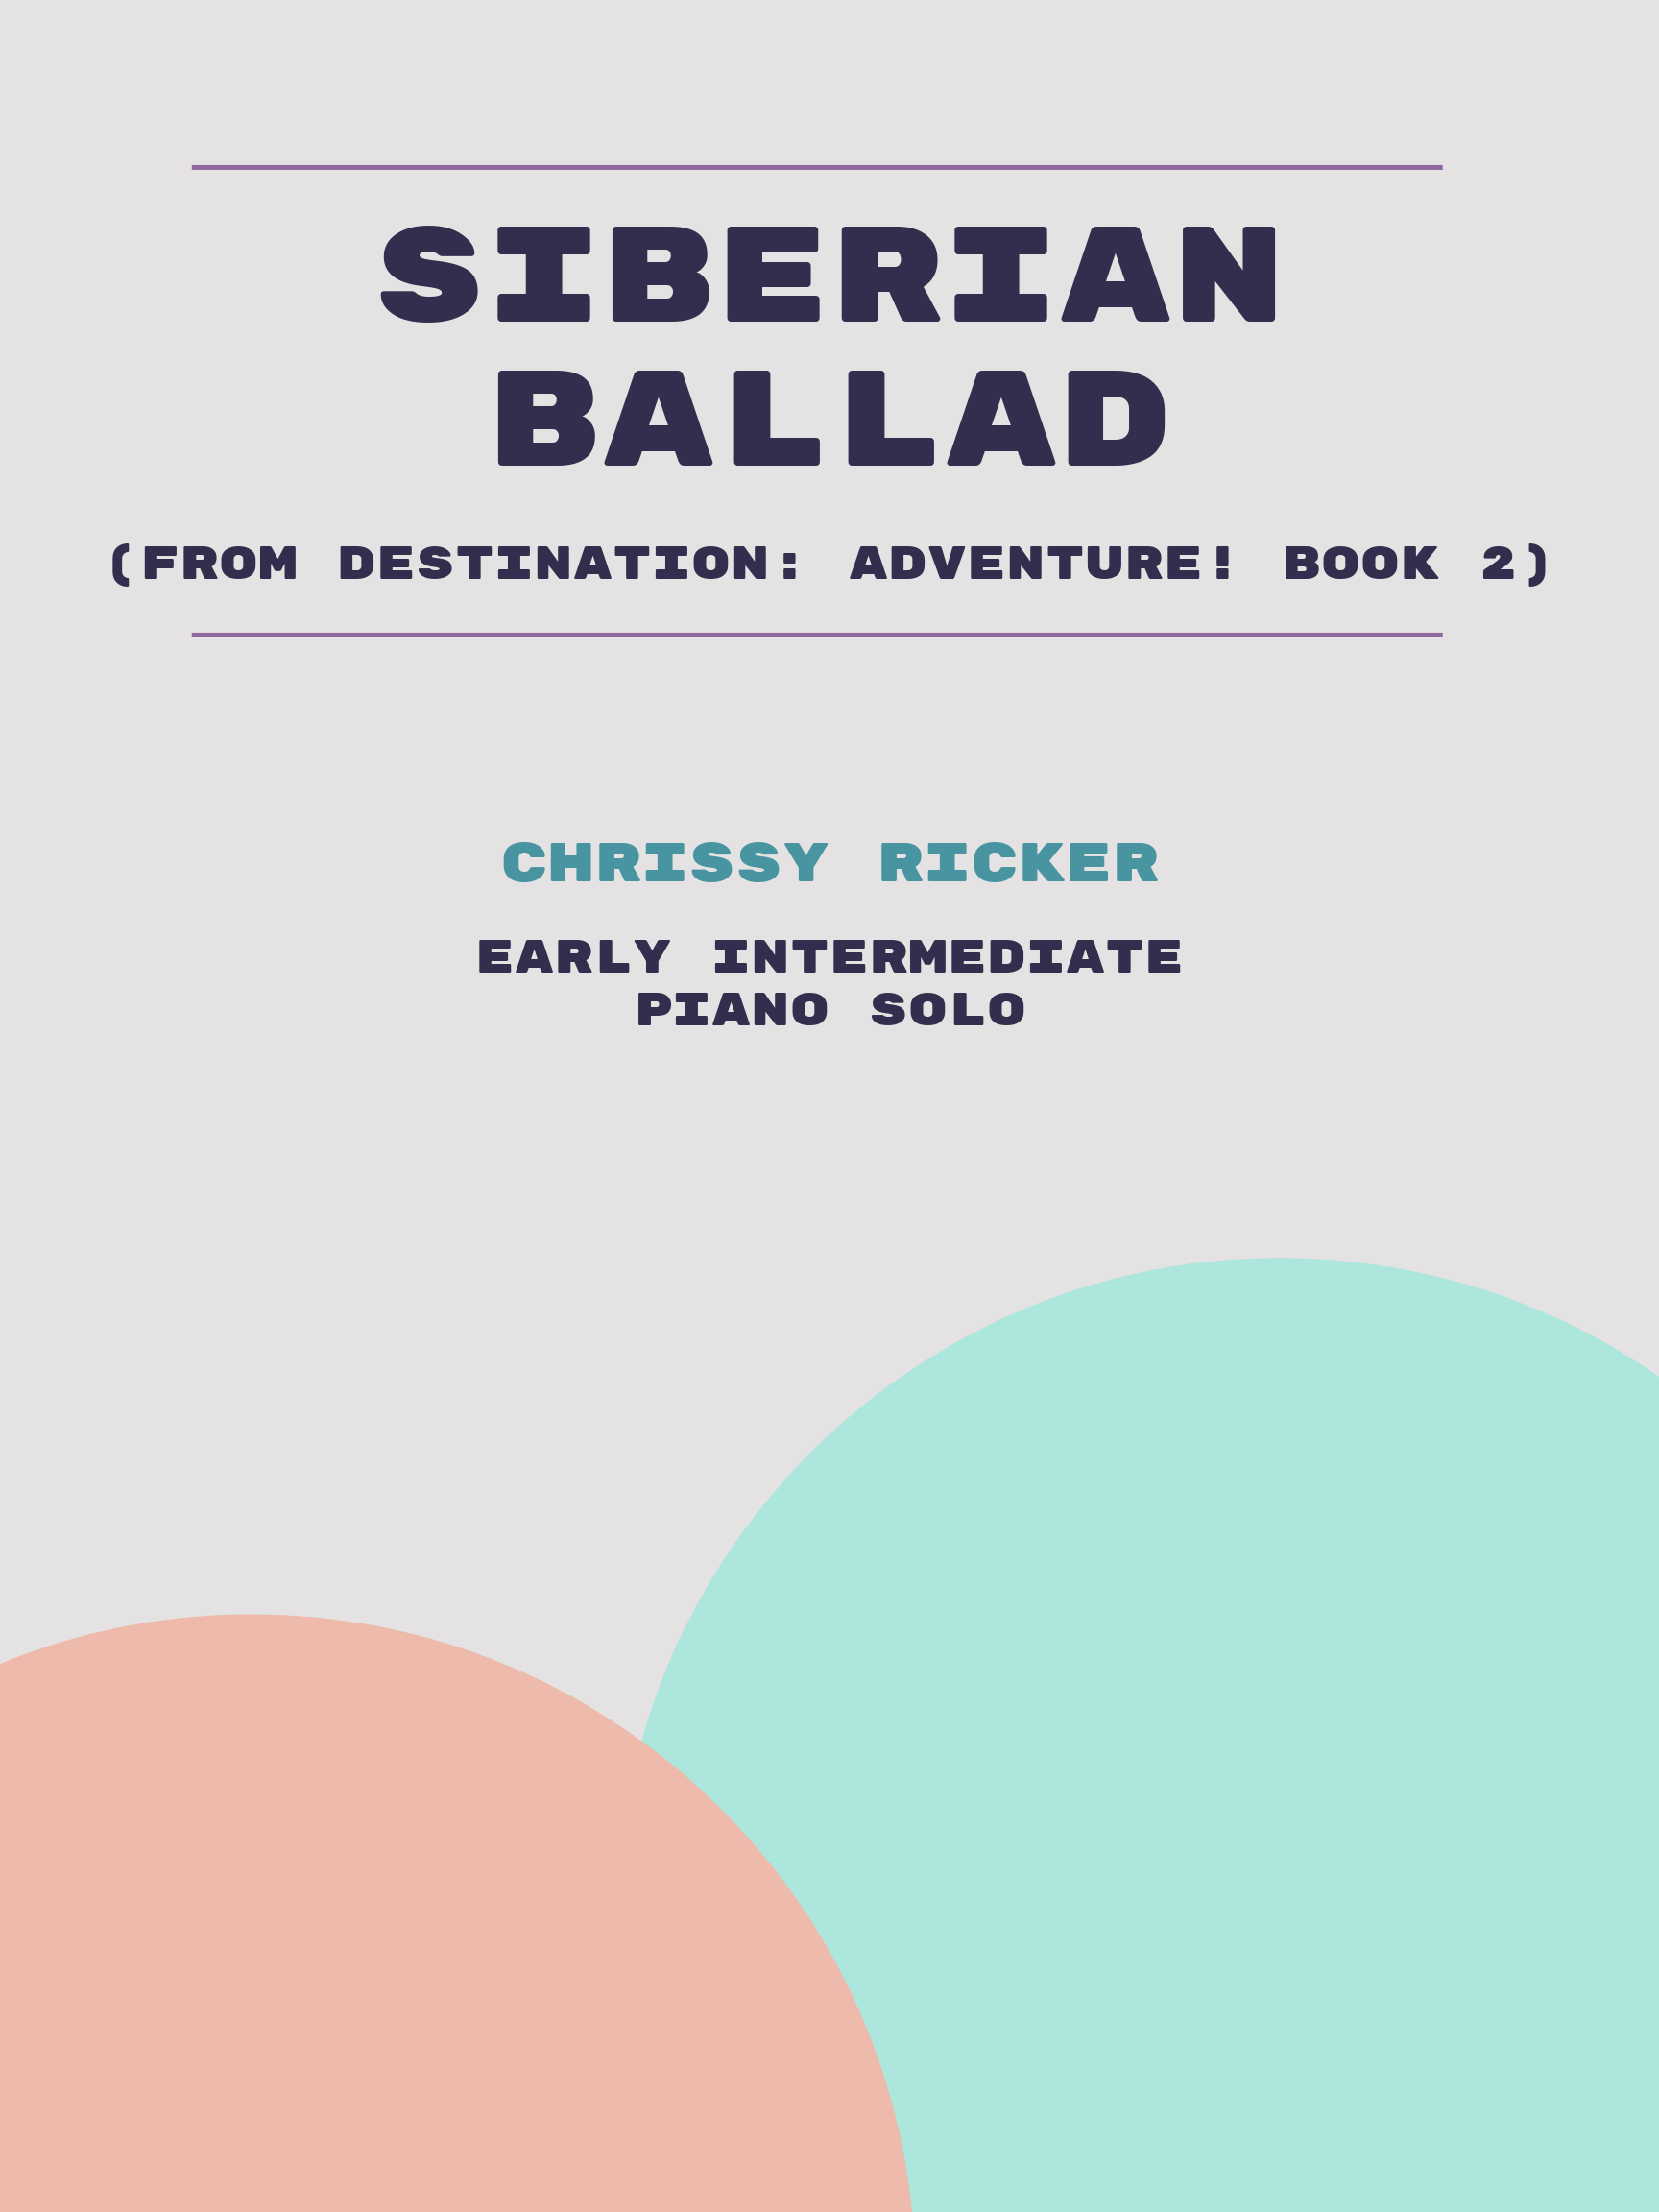 Siberian Ballad by Chrissy Ricker